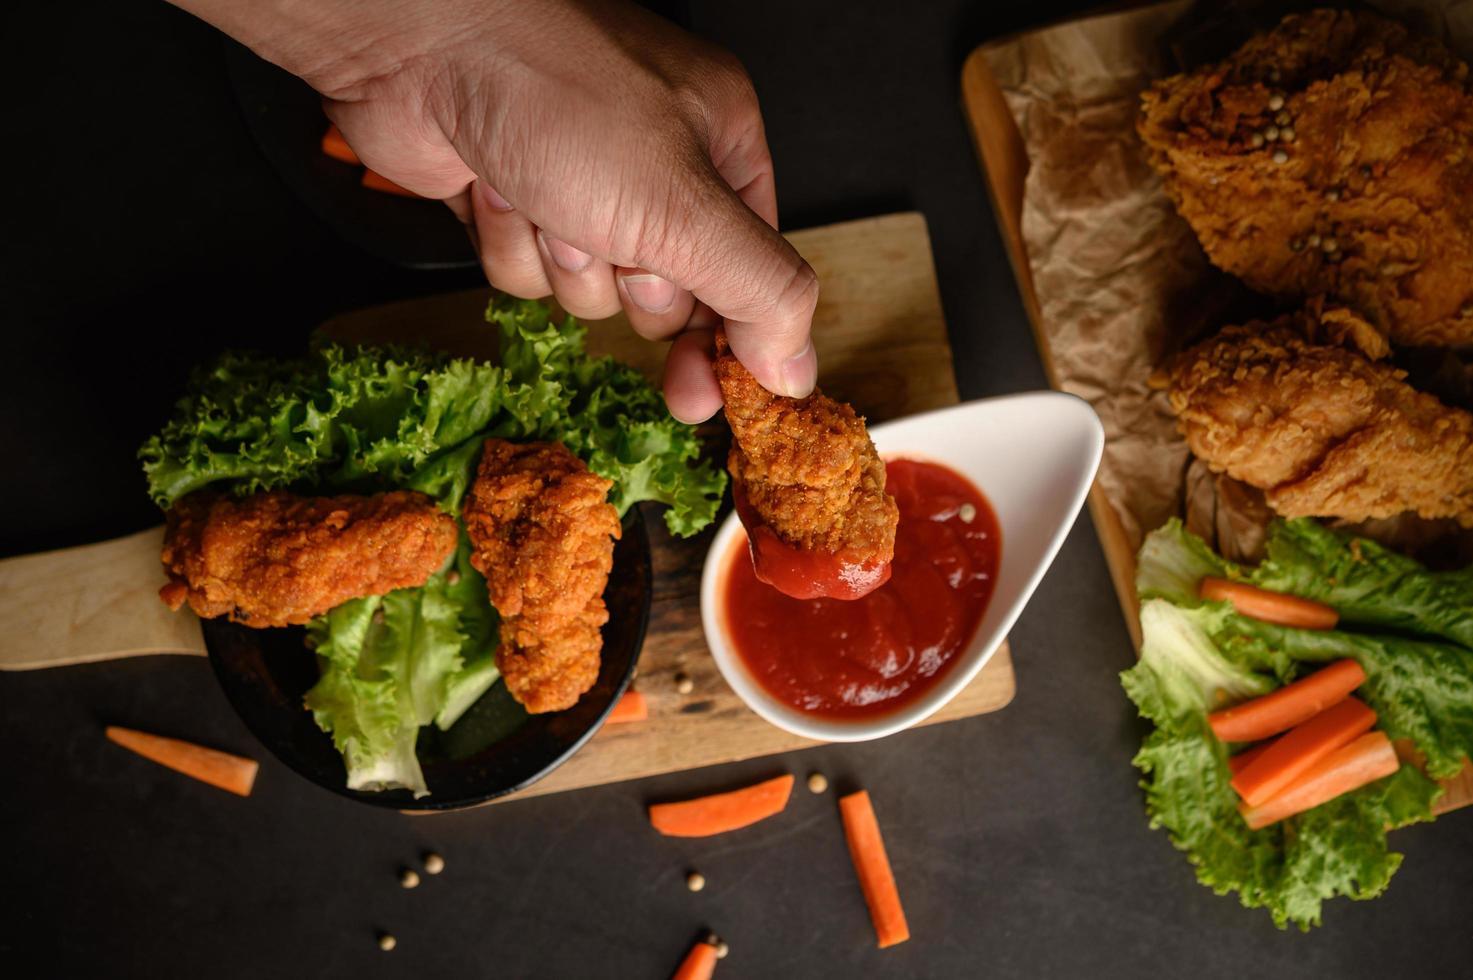 hand doppa krispig stekt kyckling i sås foto